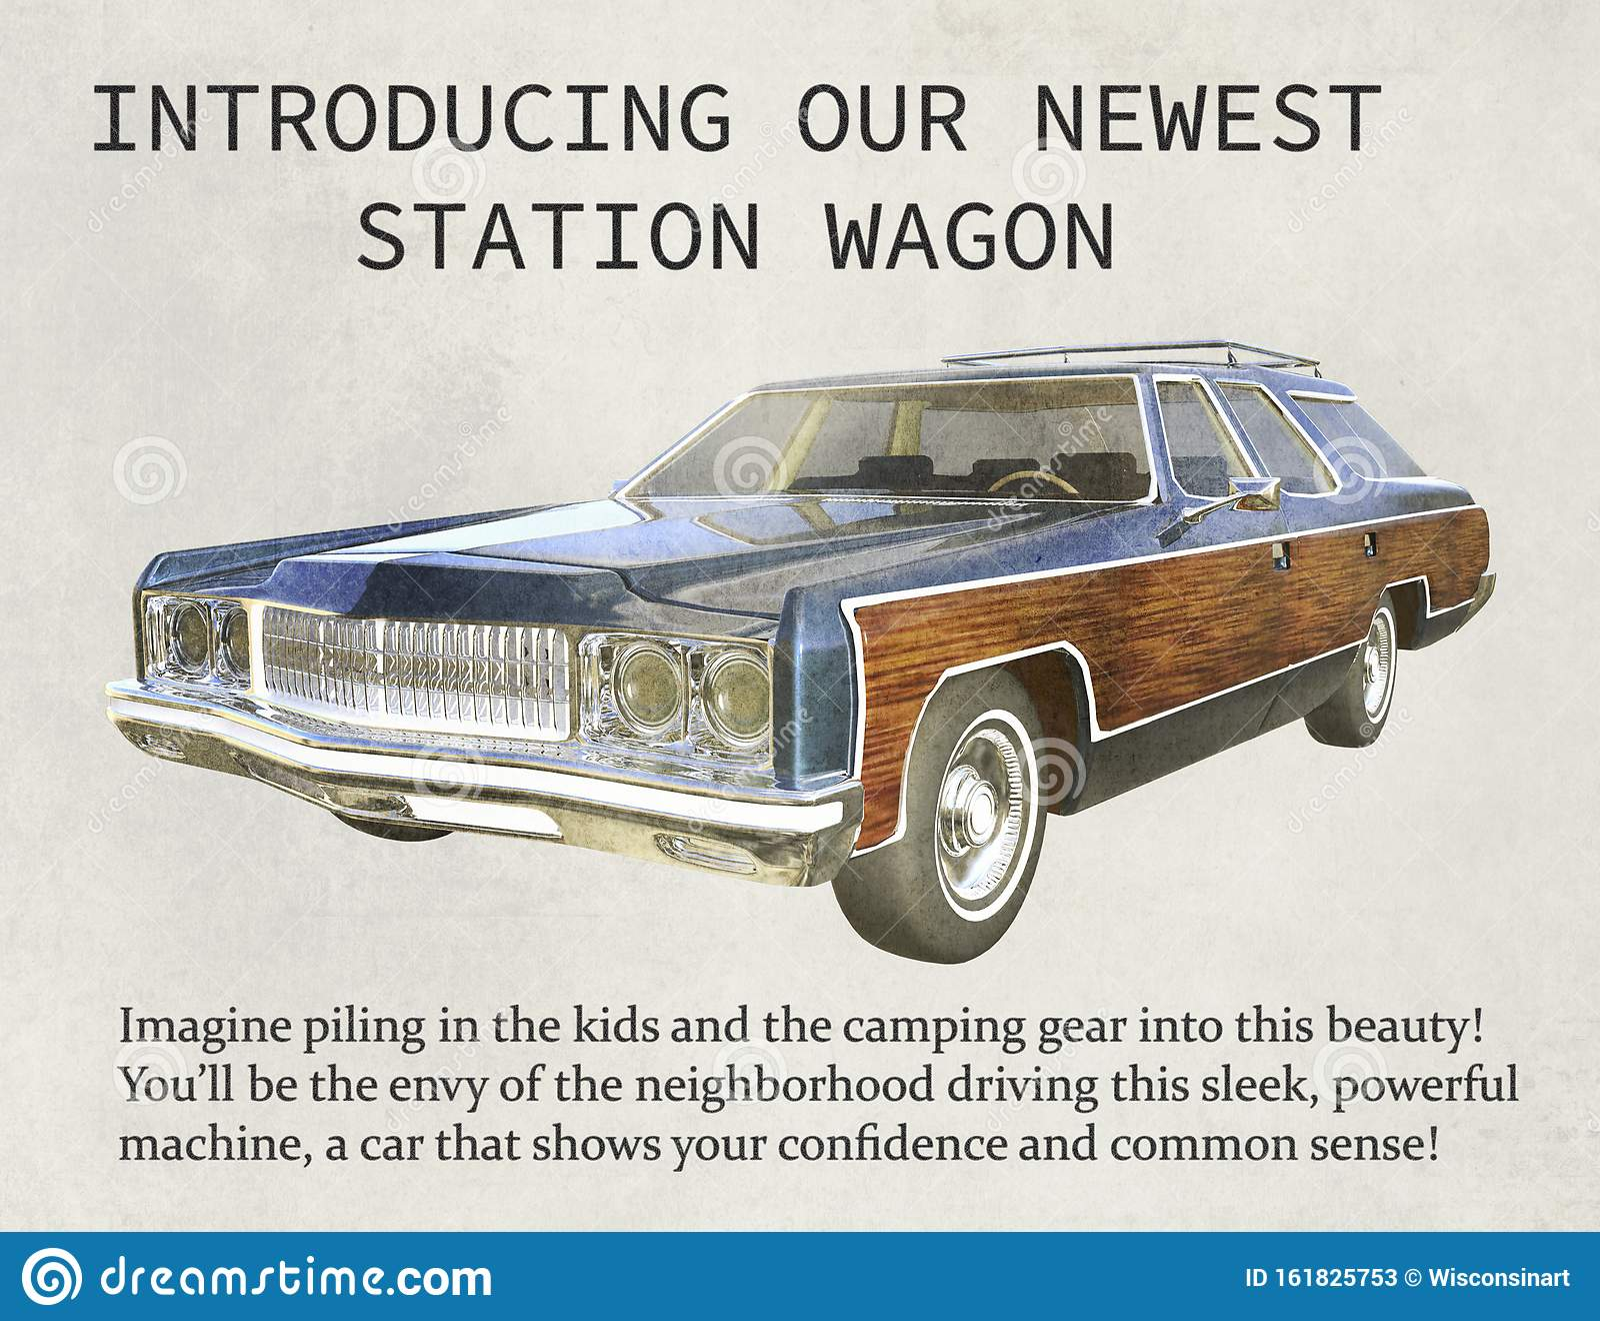 Vintage Station Wagon Sales Marketing Advertisement Stock Image Image Of Print Business 161825753